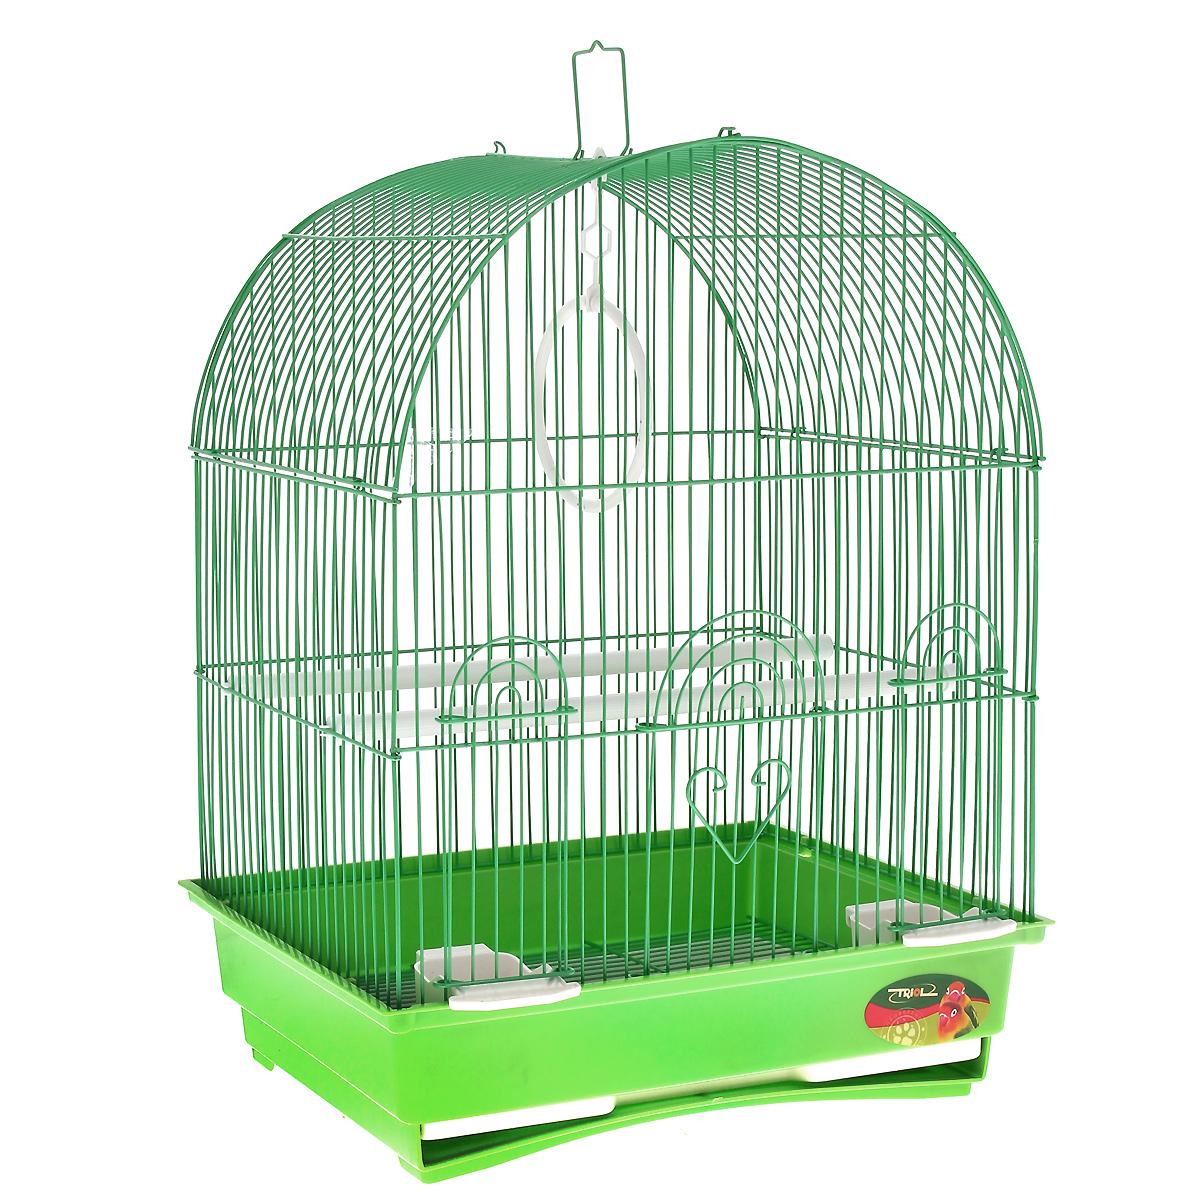 Клетка для птиц, цвет: зеленый, 35 см х 28 см х 46 см